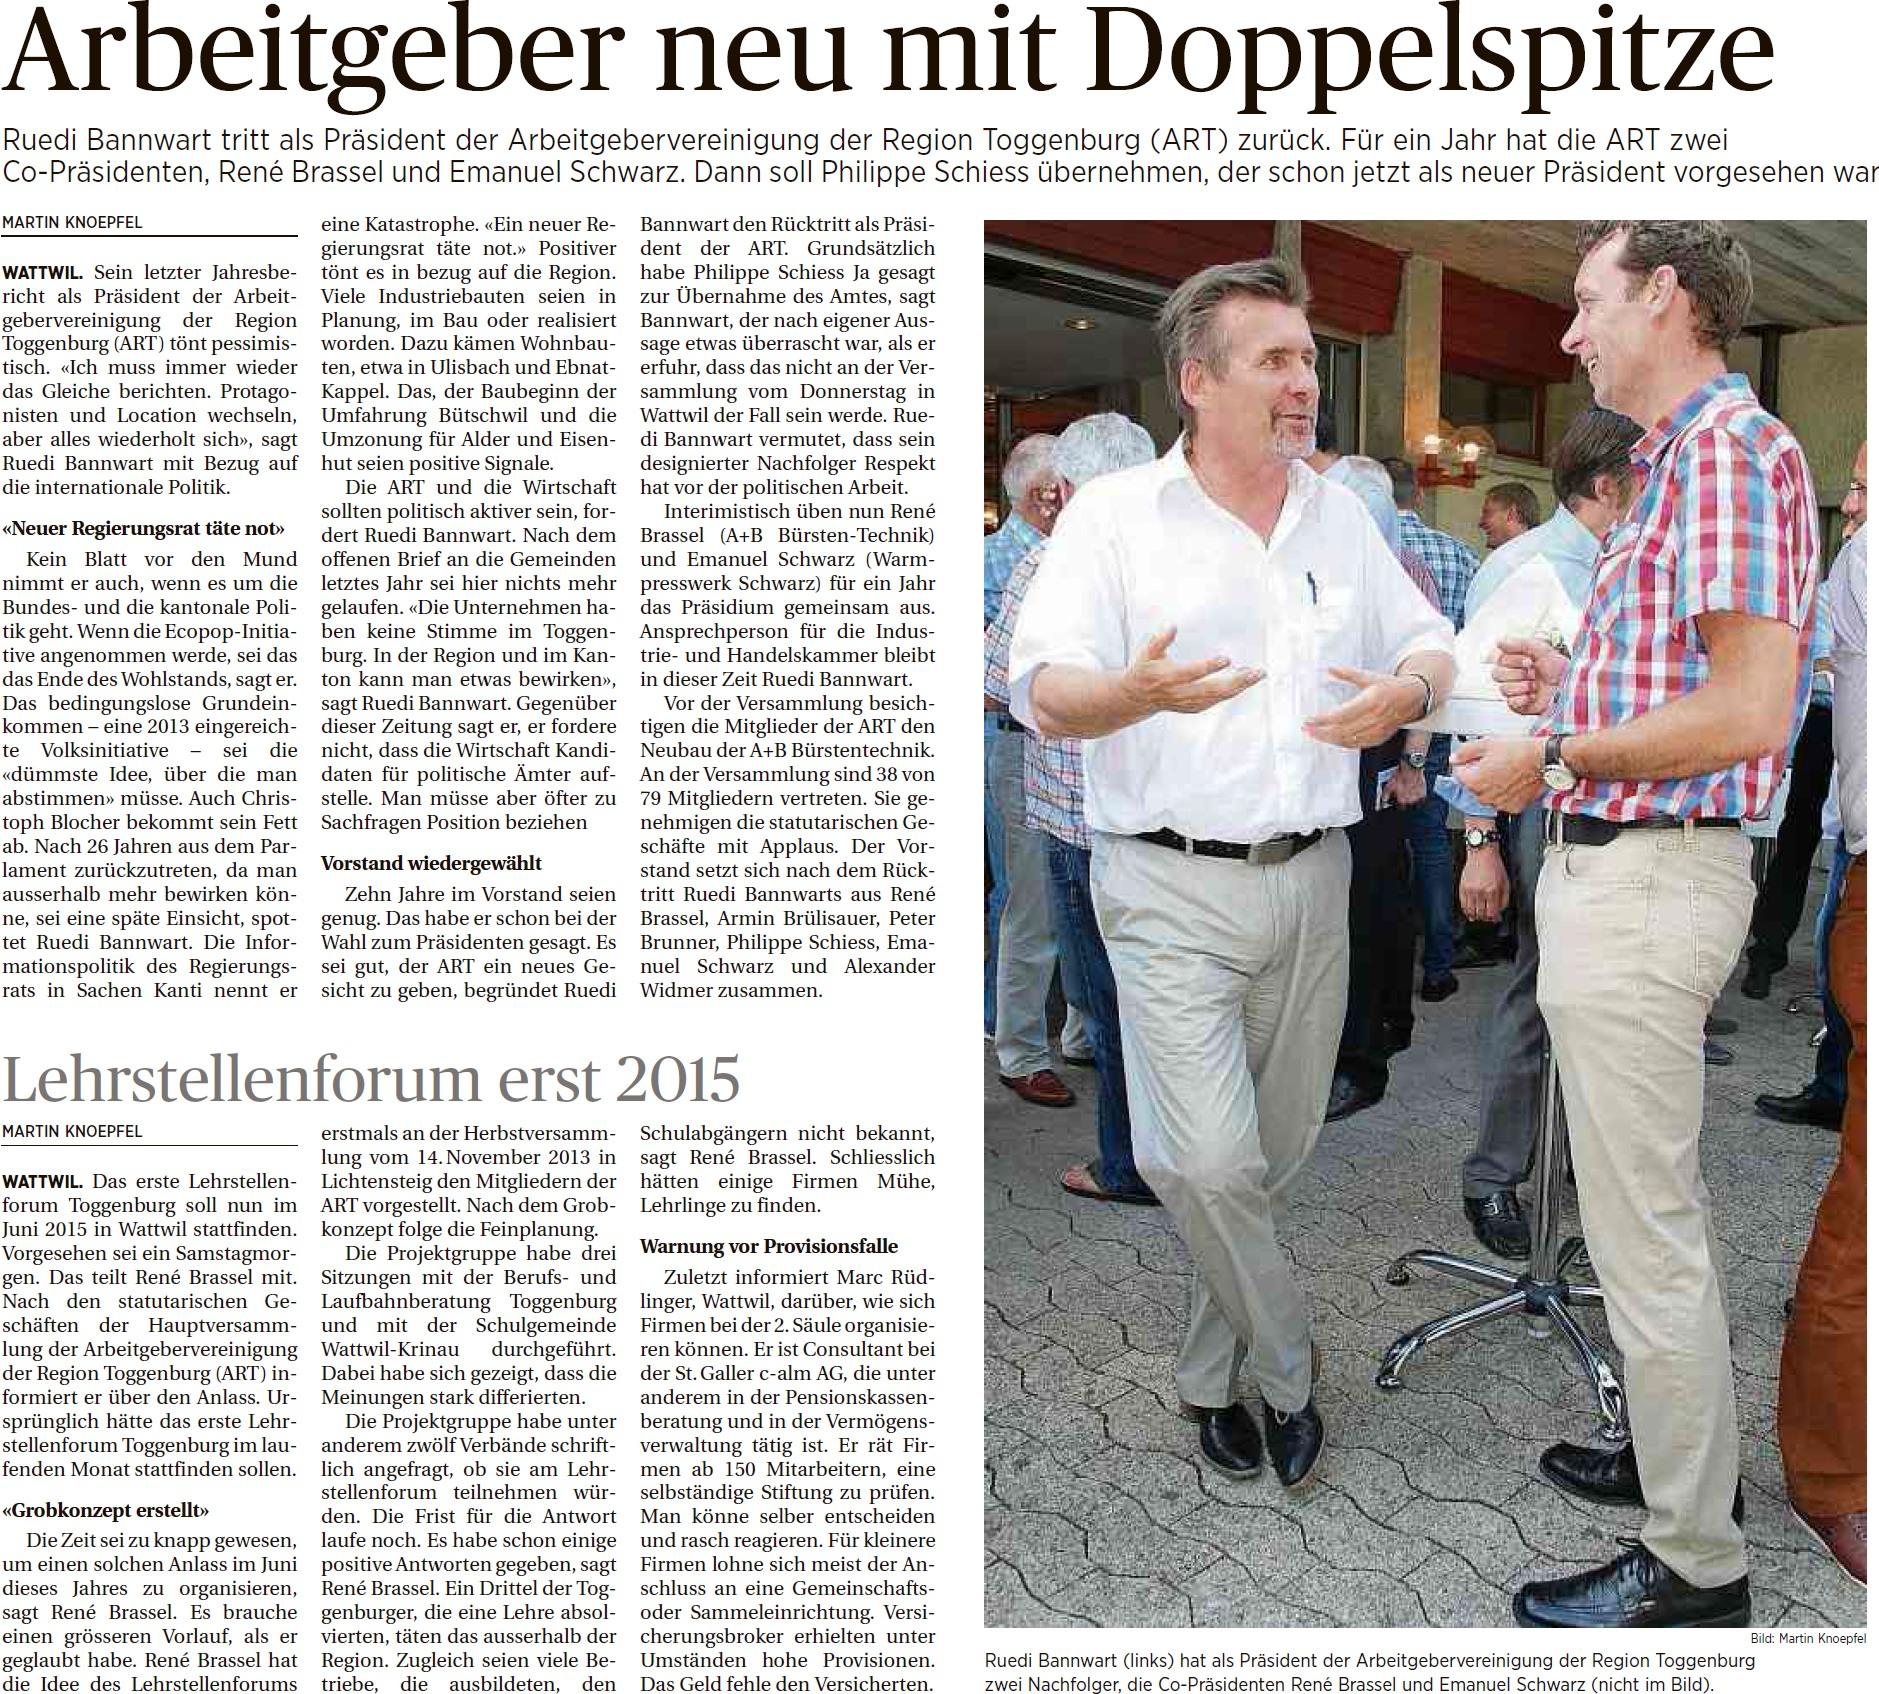 Arbeitgeber neu mit Doppelspitze (Samstag, 14.06.2014)